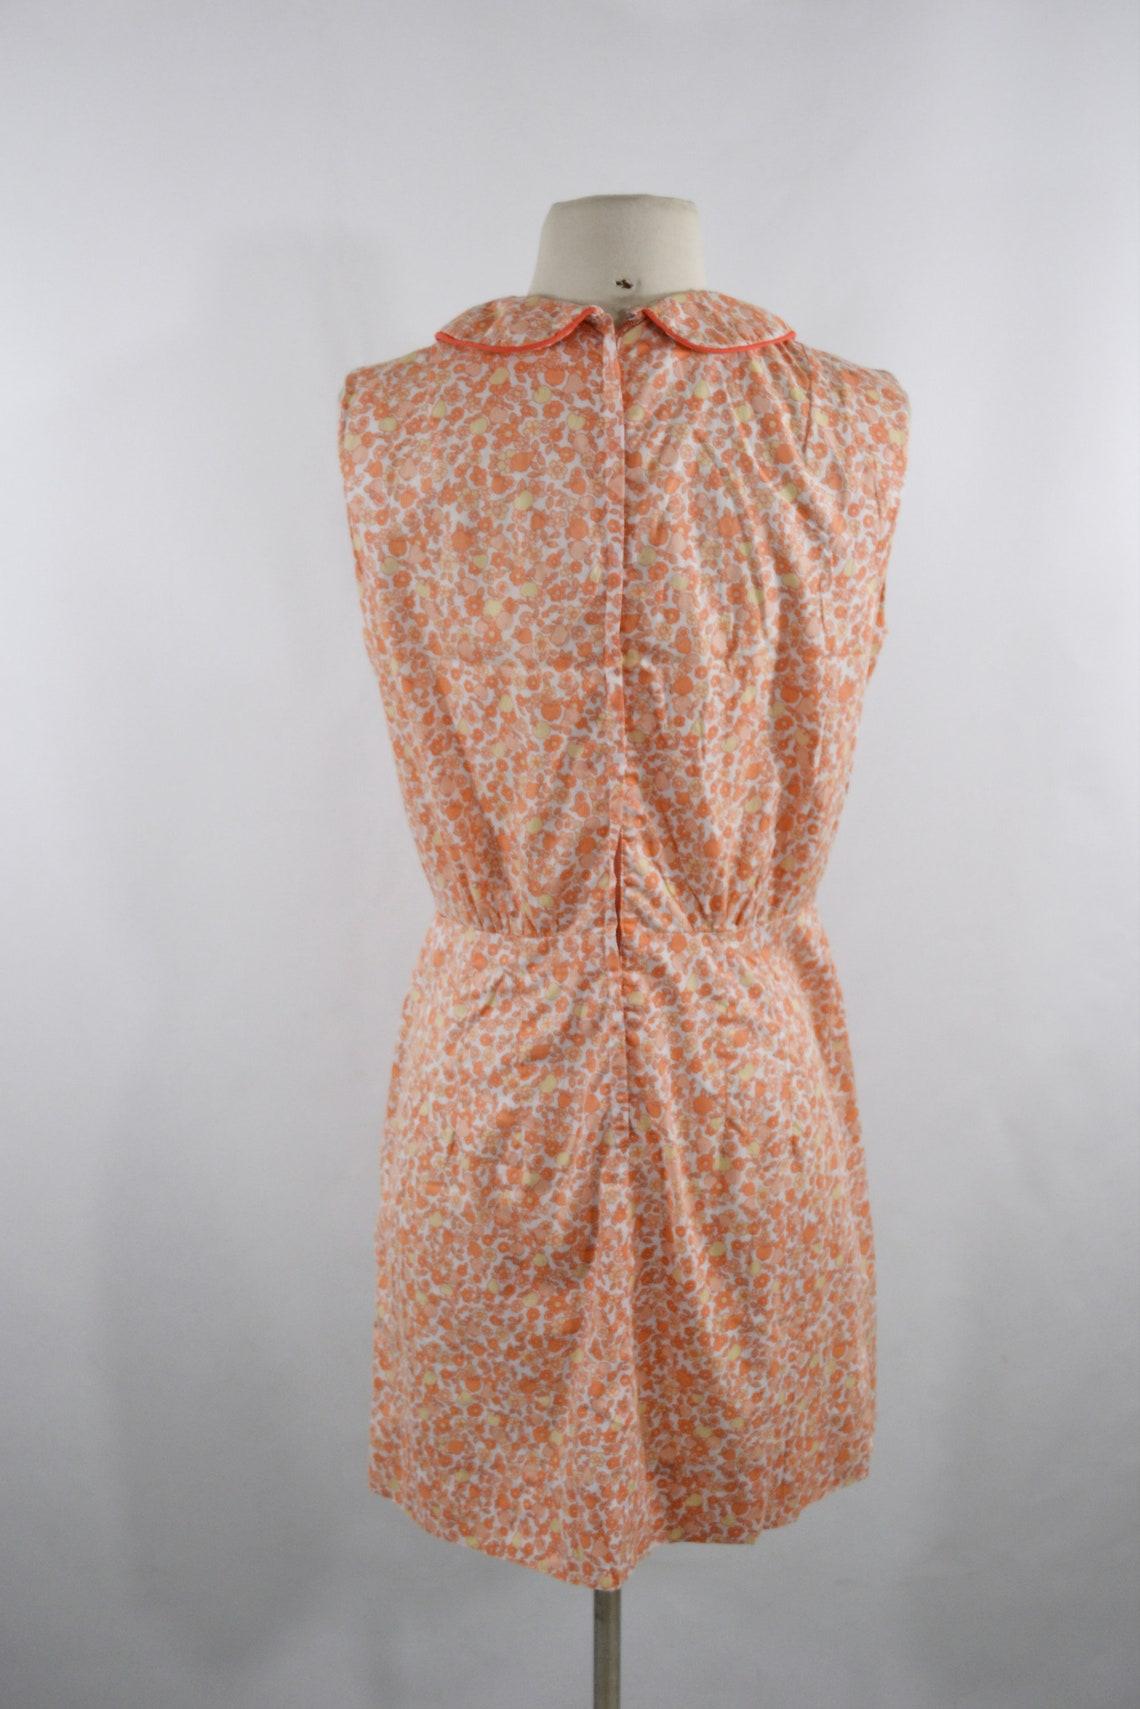 1950s/1960s Pale Orange Novelty Fruit Print Sleeveless Shift